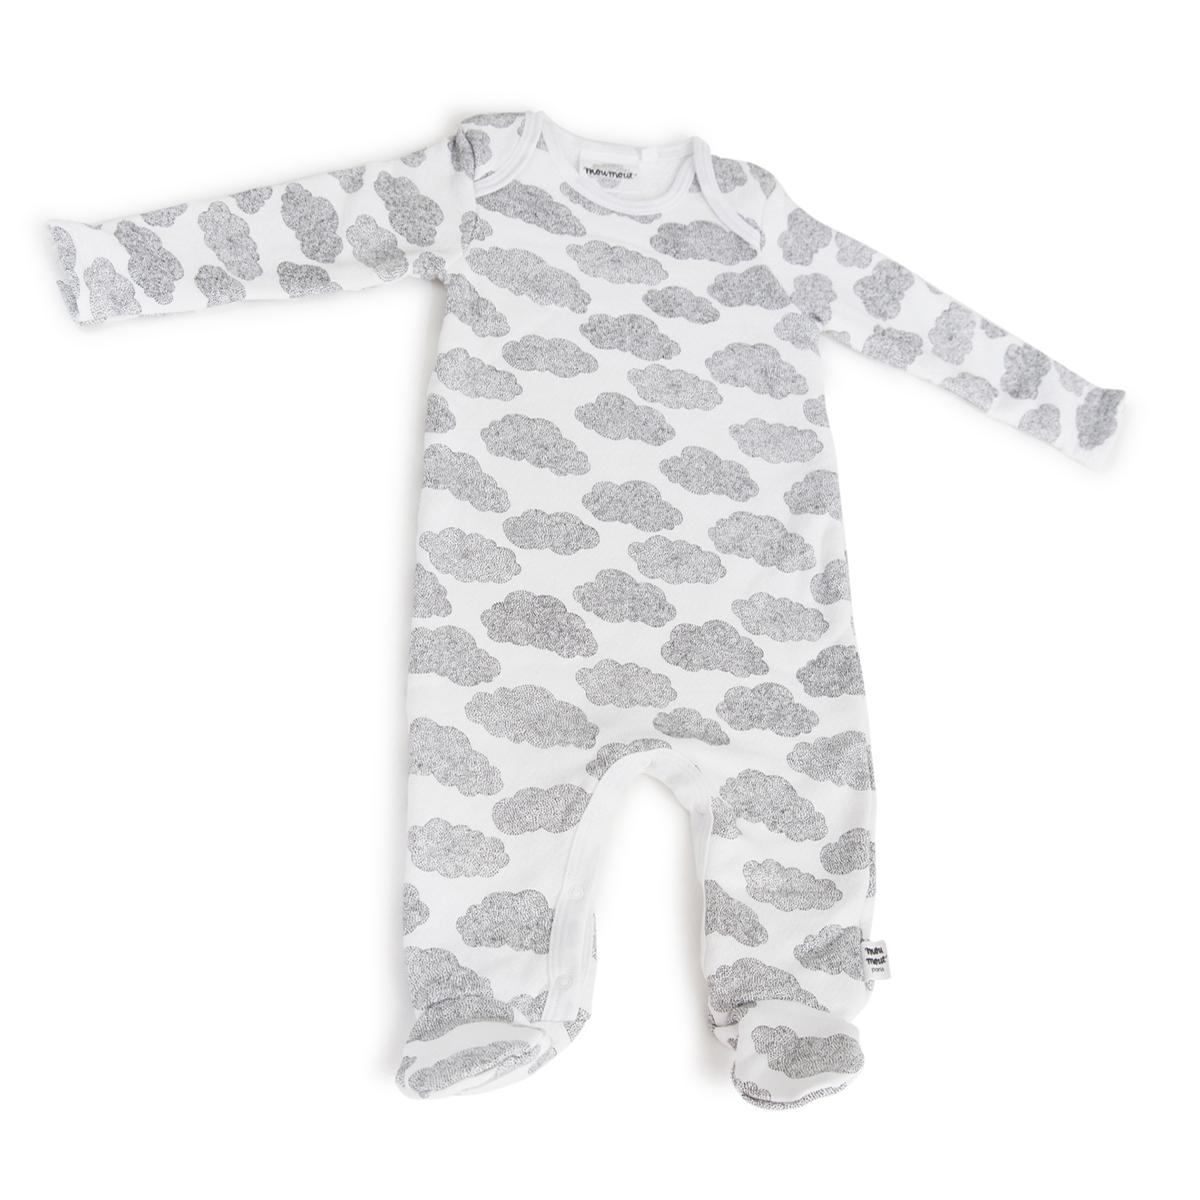 Body & Pyjama Pyjama Bobo Feet Cotton Nuages - 6 Mois Pyjama Bobo Feet Cotton Nuages - 6 Mois